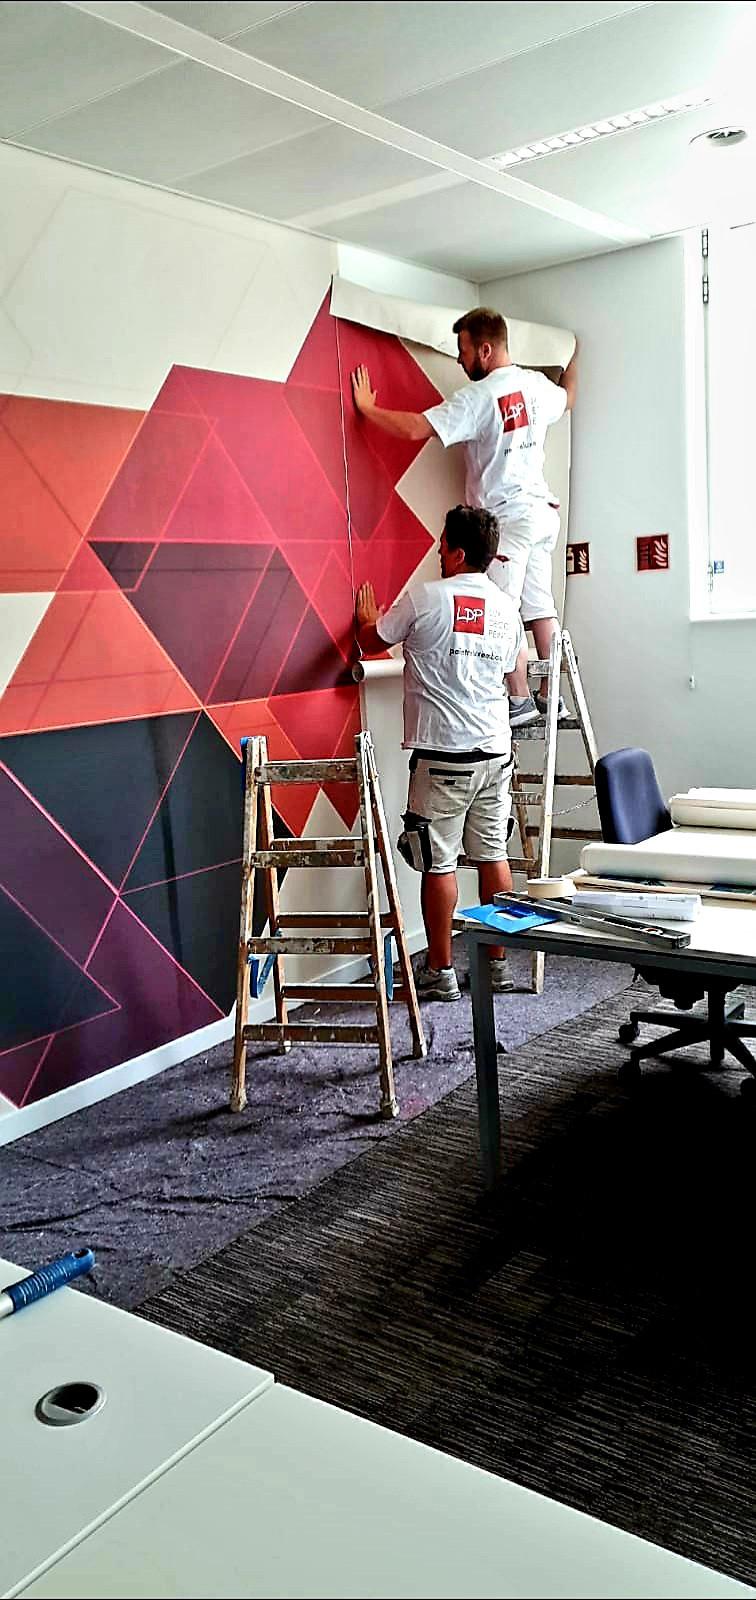 Siège social AXA Luxembourg papier peint